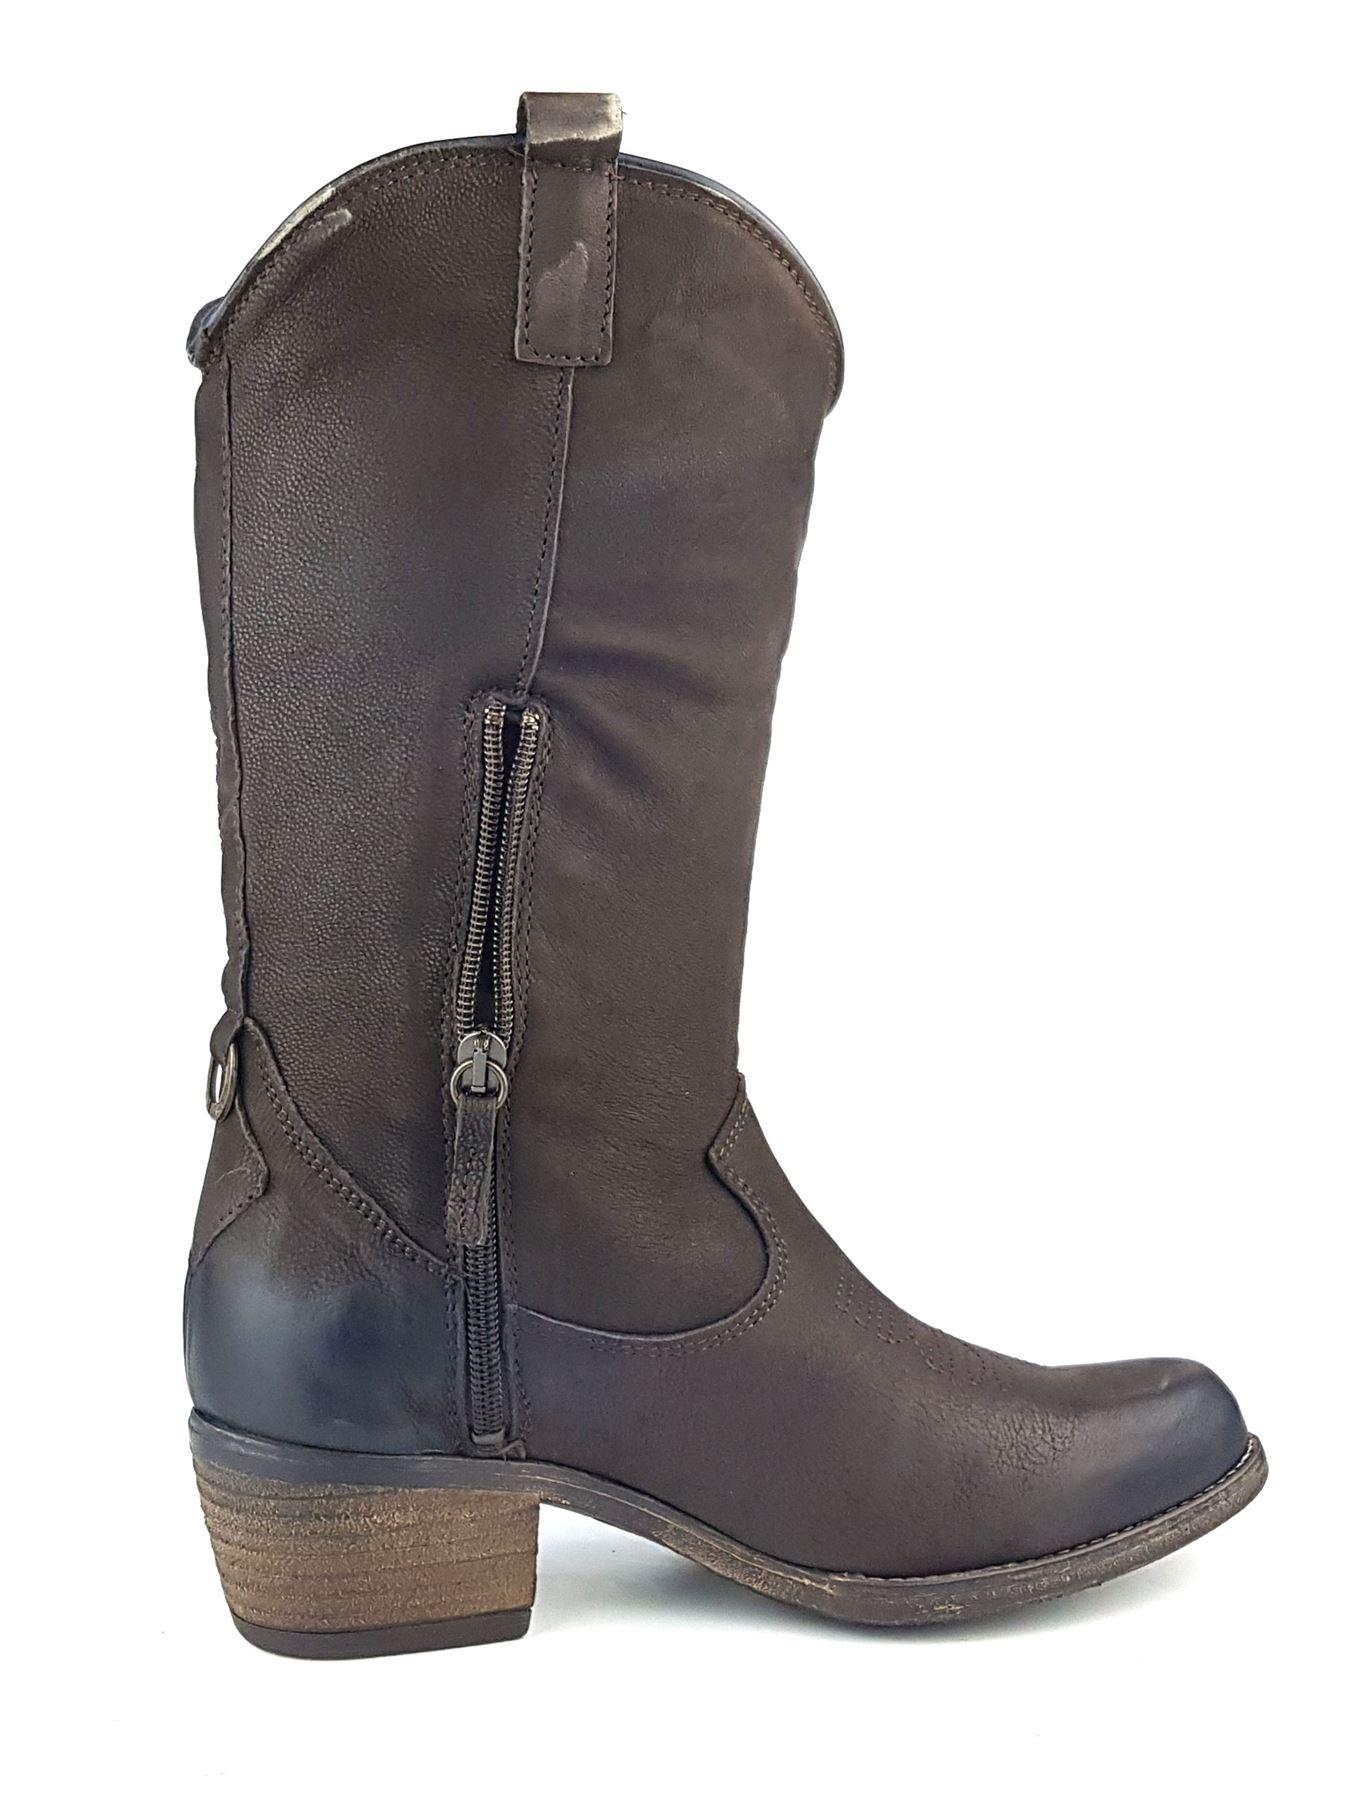 Wrangler Carson Hi Knee High Leather Chelsea Cowboy Heel Boots Dark Brown